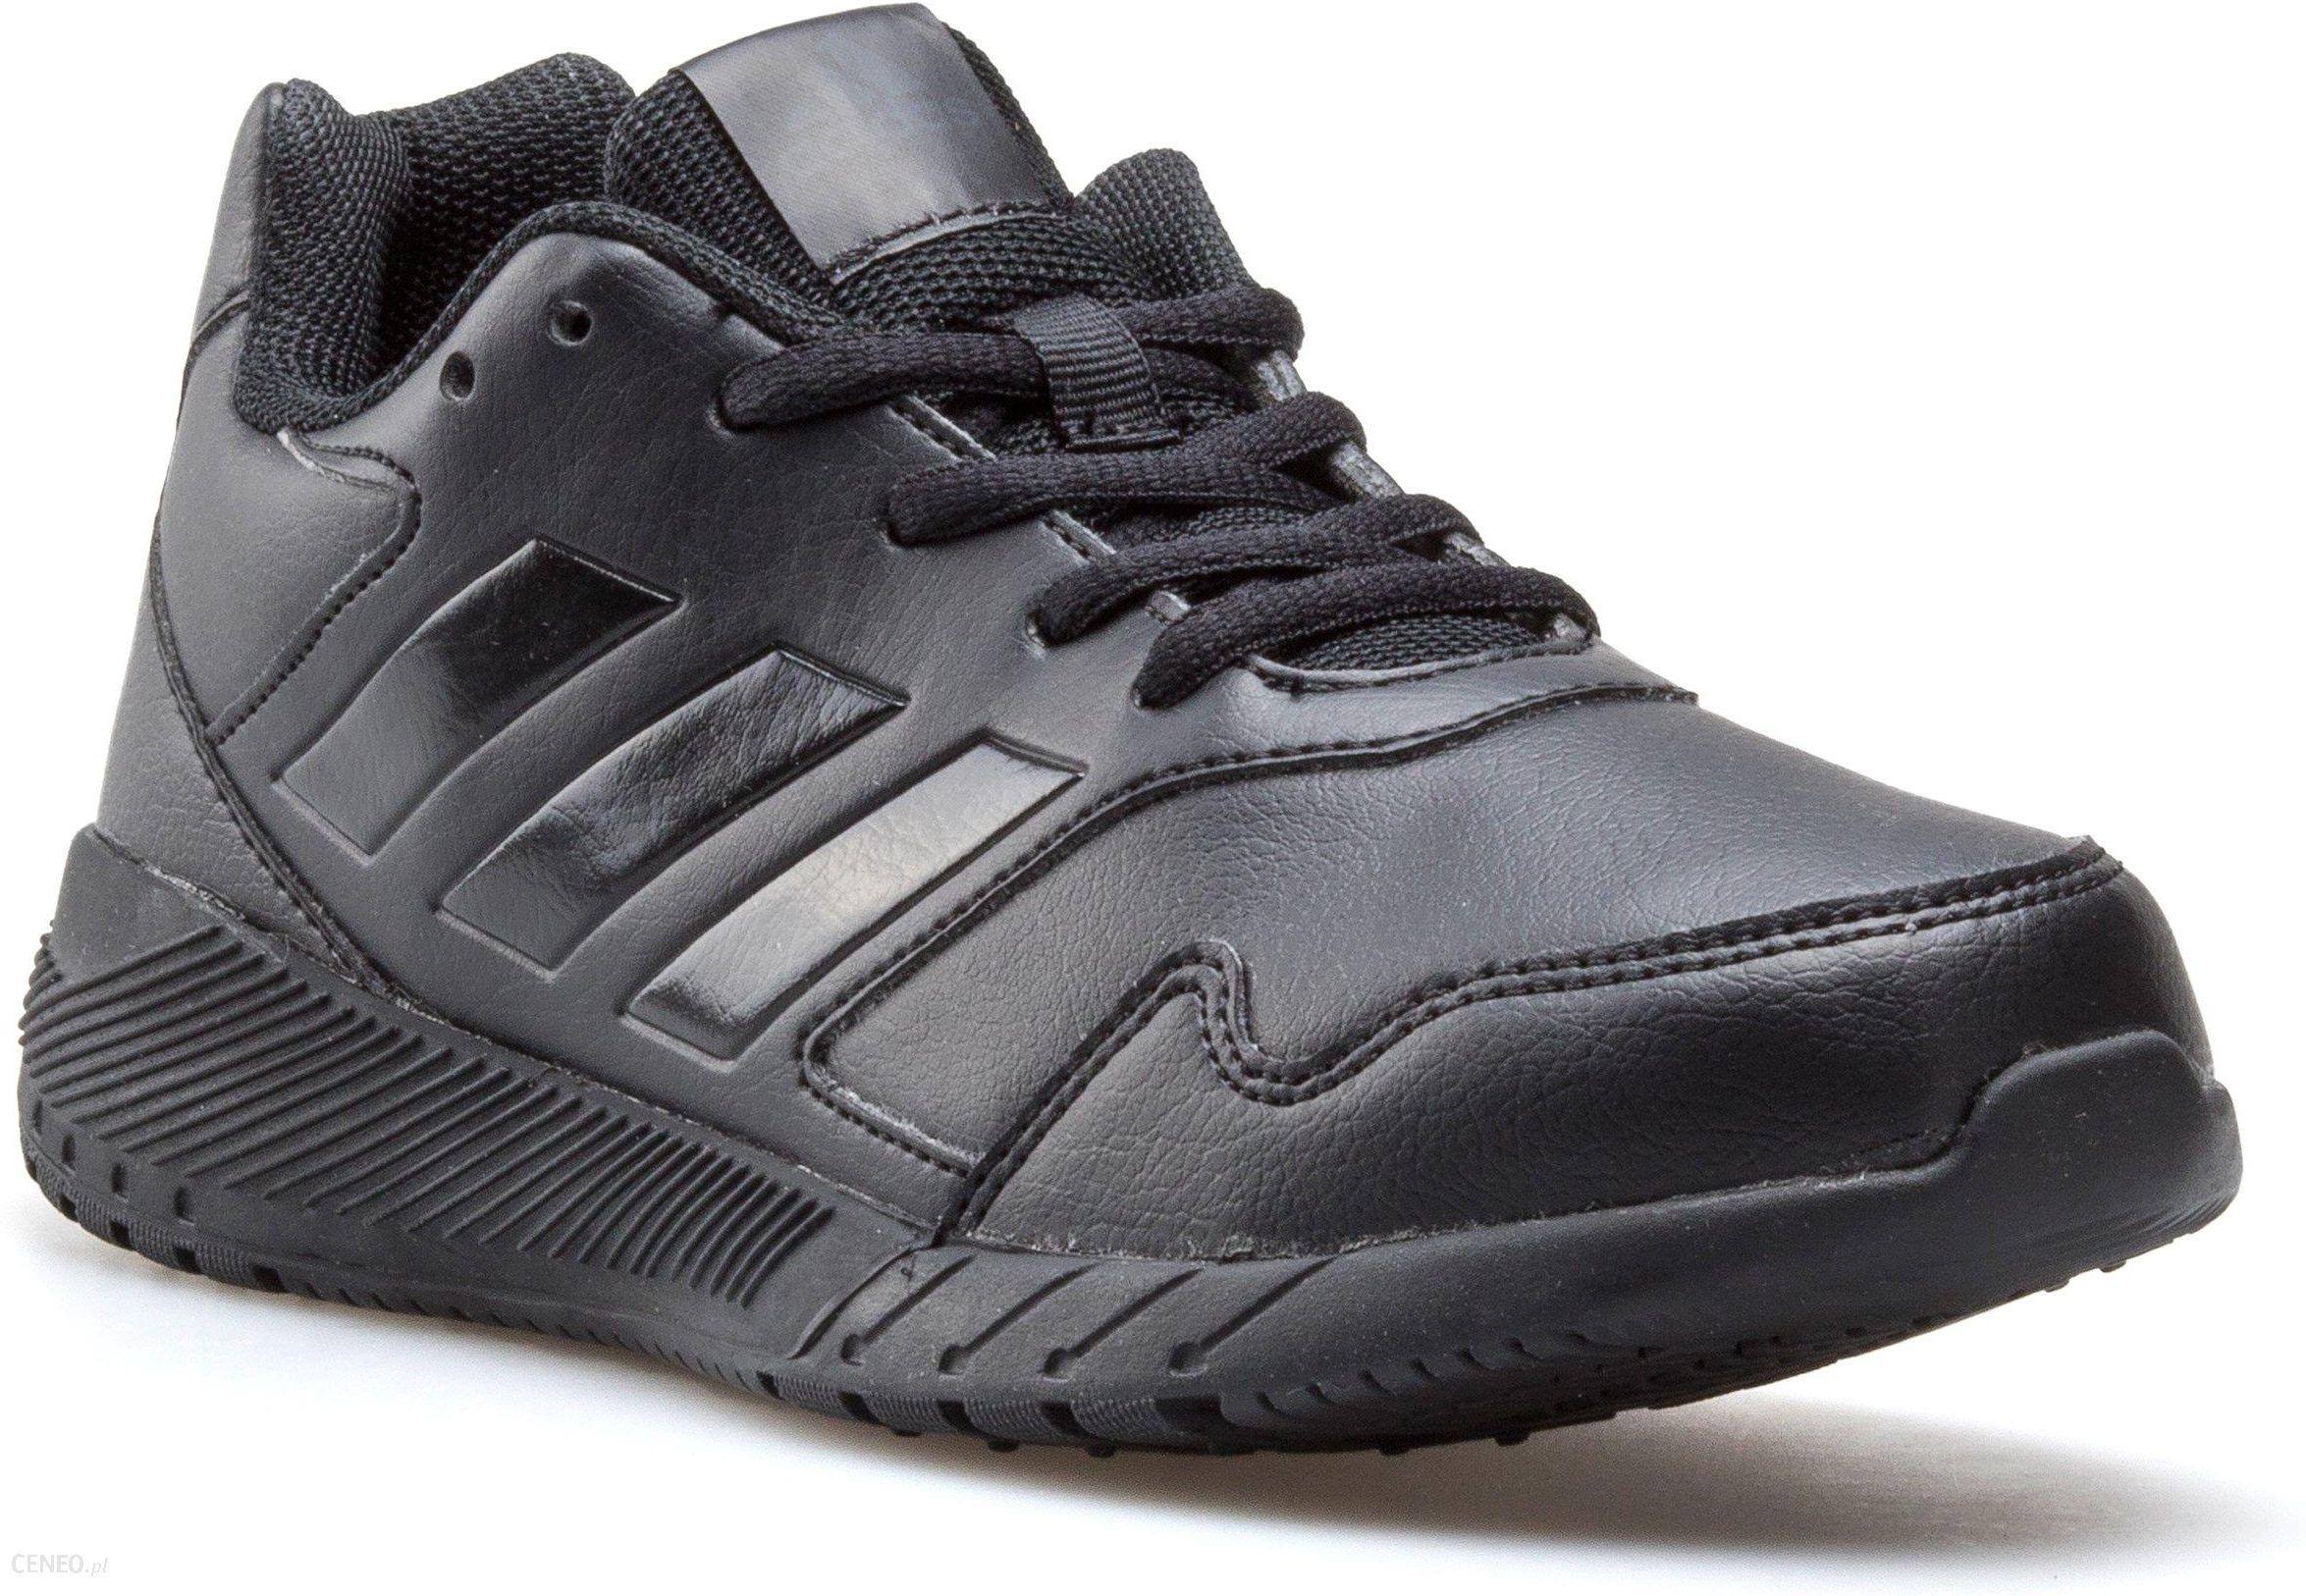 Buty dziecięce adidas AltaRun K BA7897 r. 35